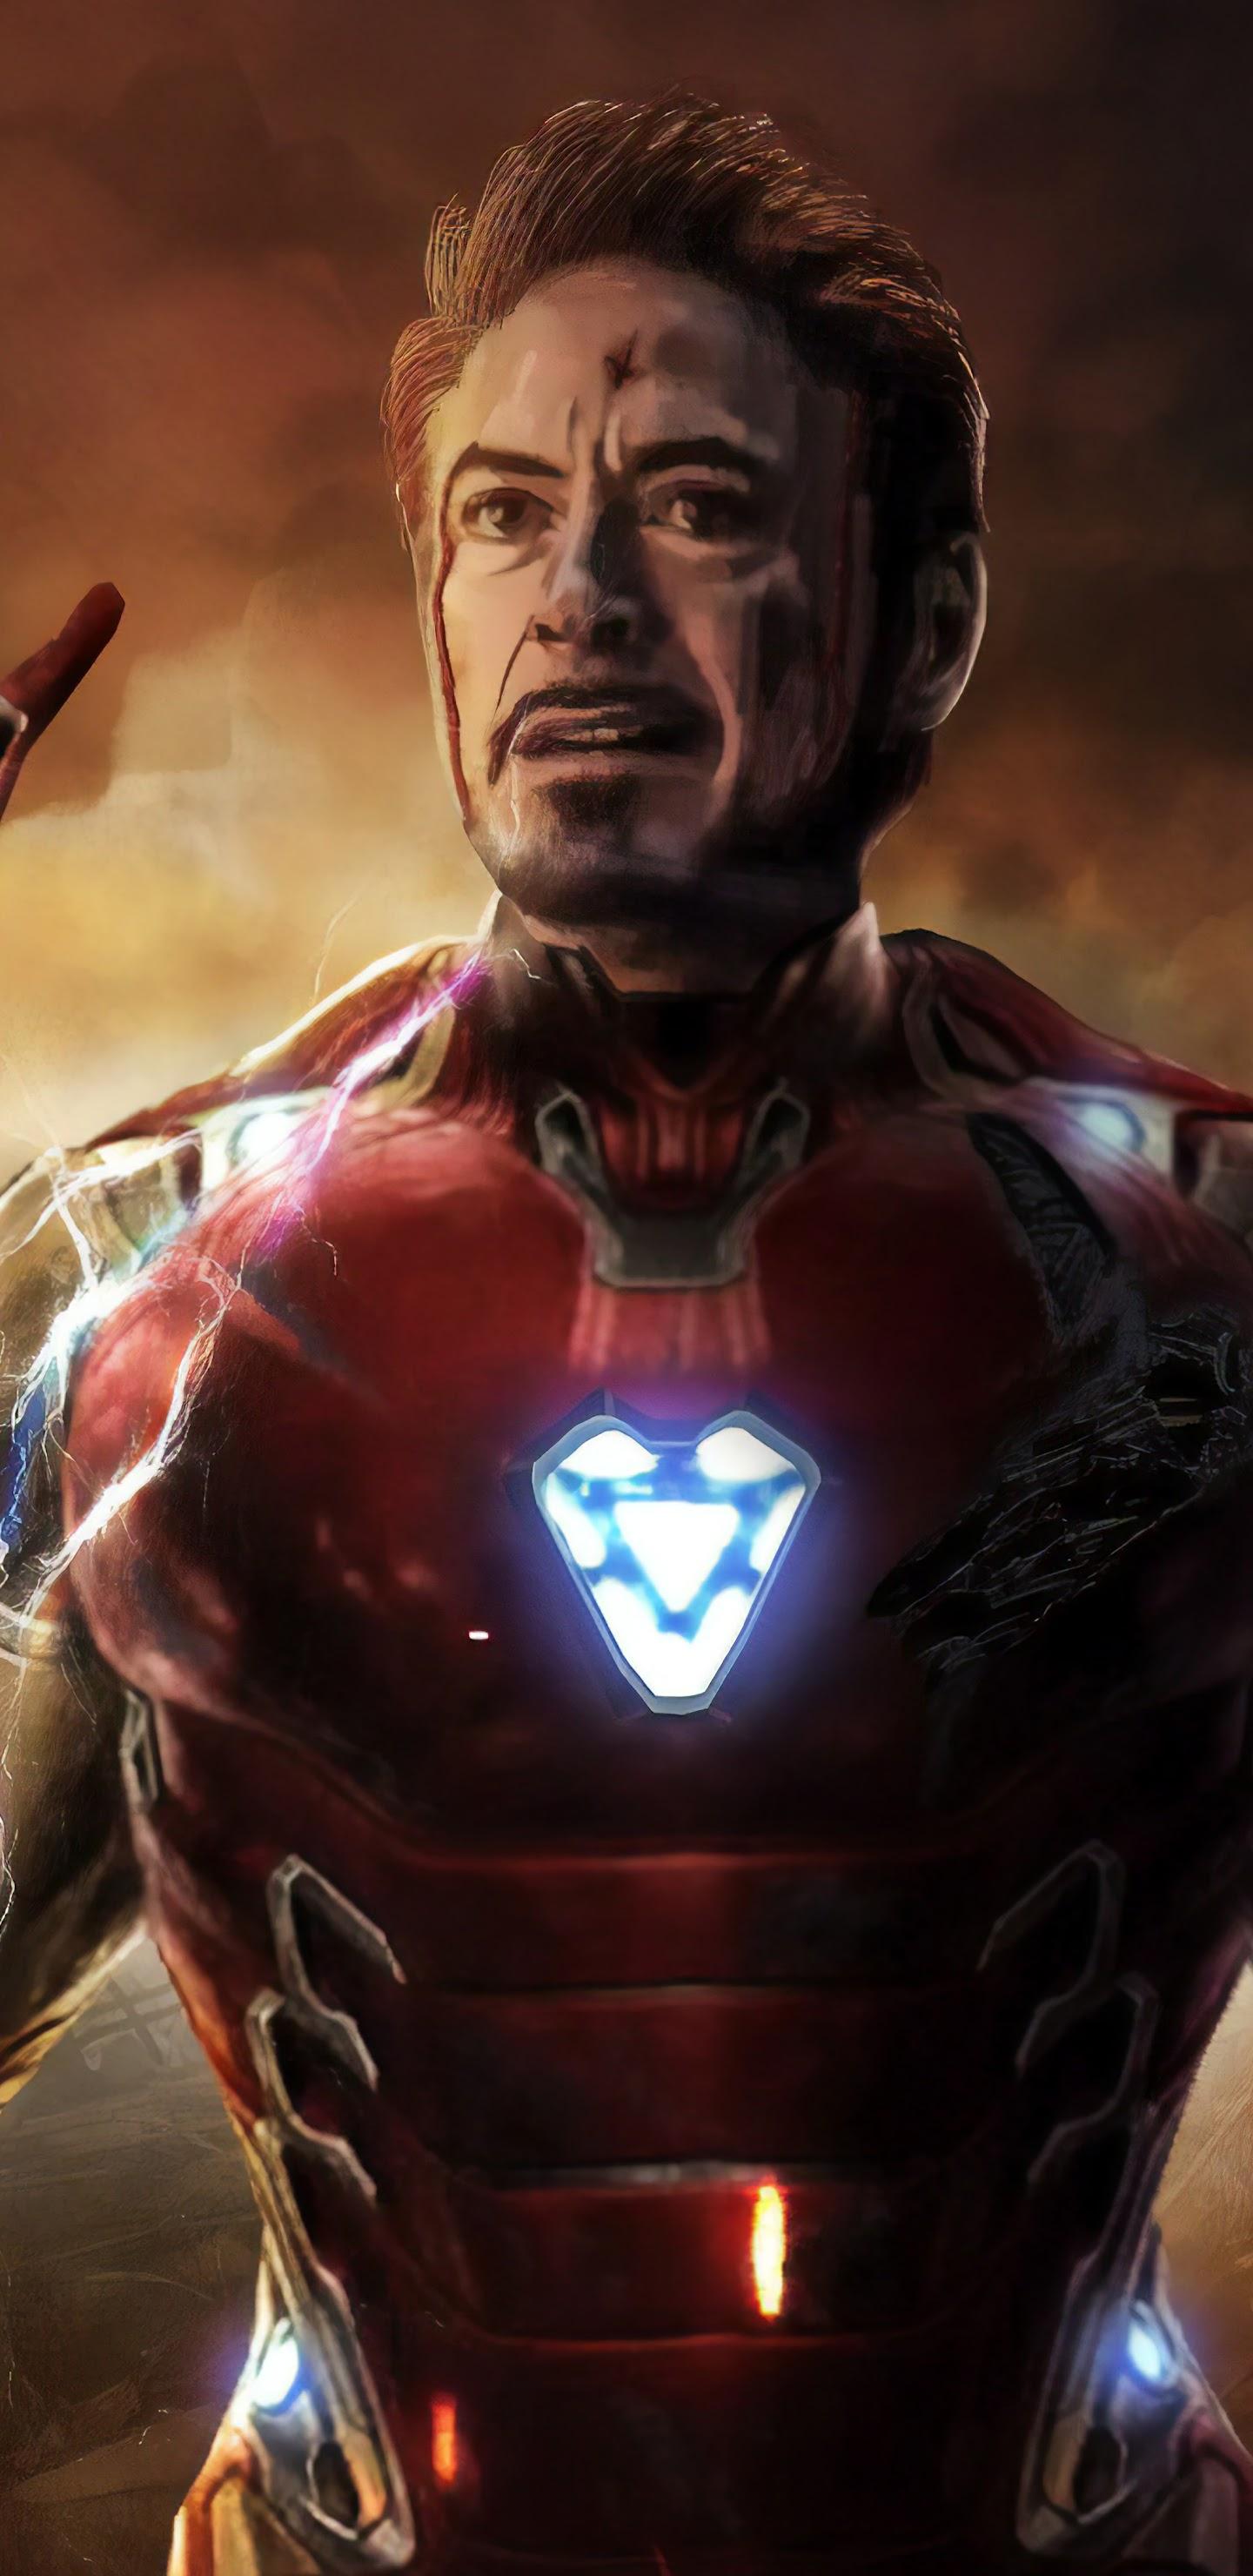 Avengers Endgame Iron Man Tony Stark Infinity Stones 8k